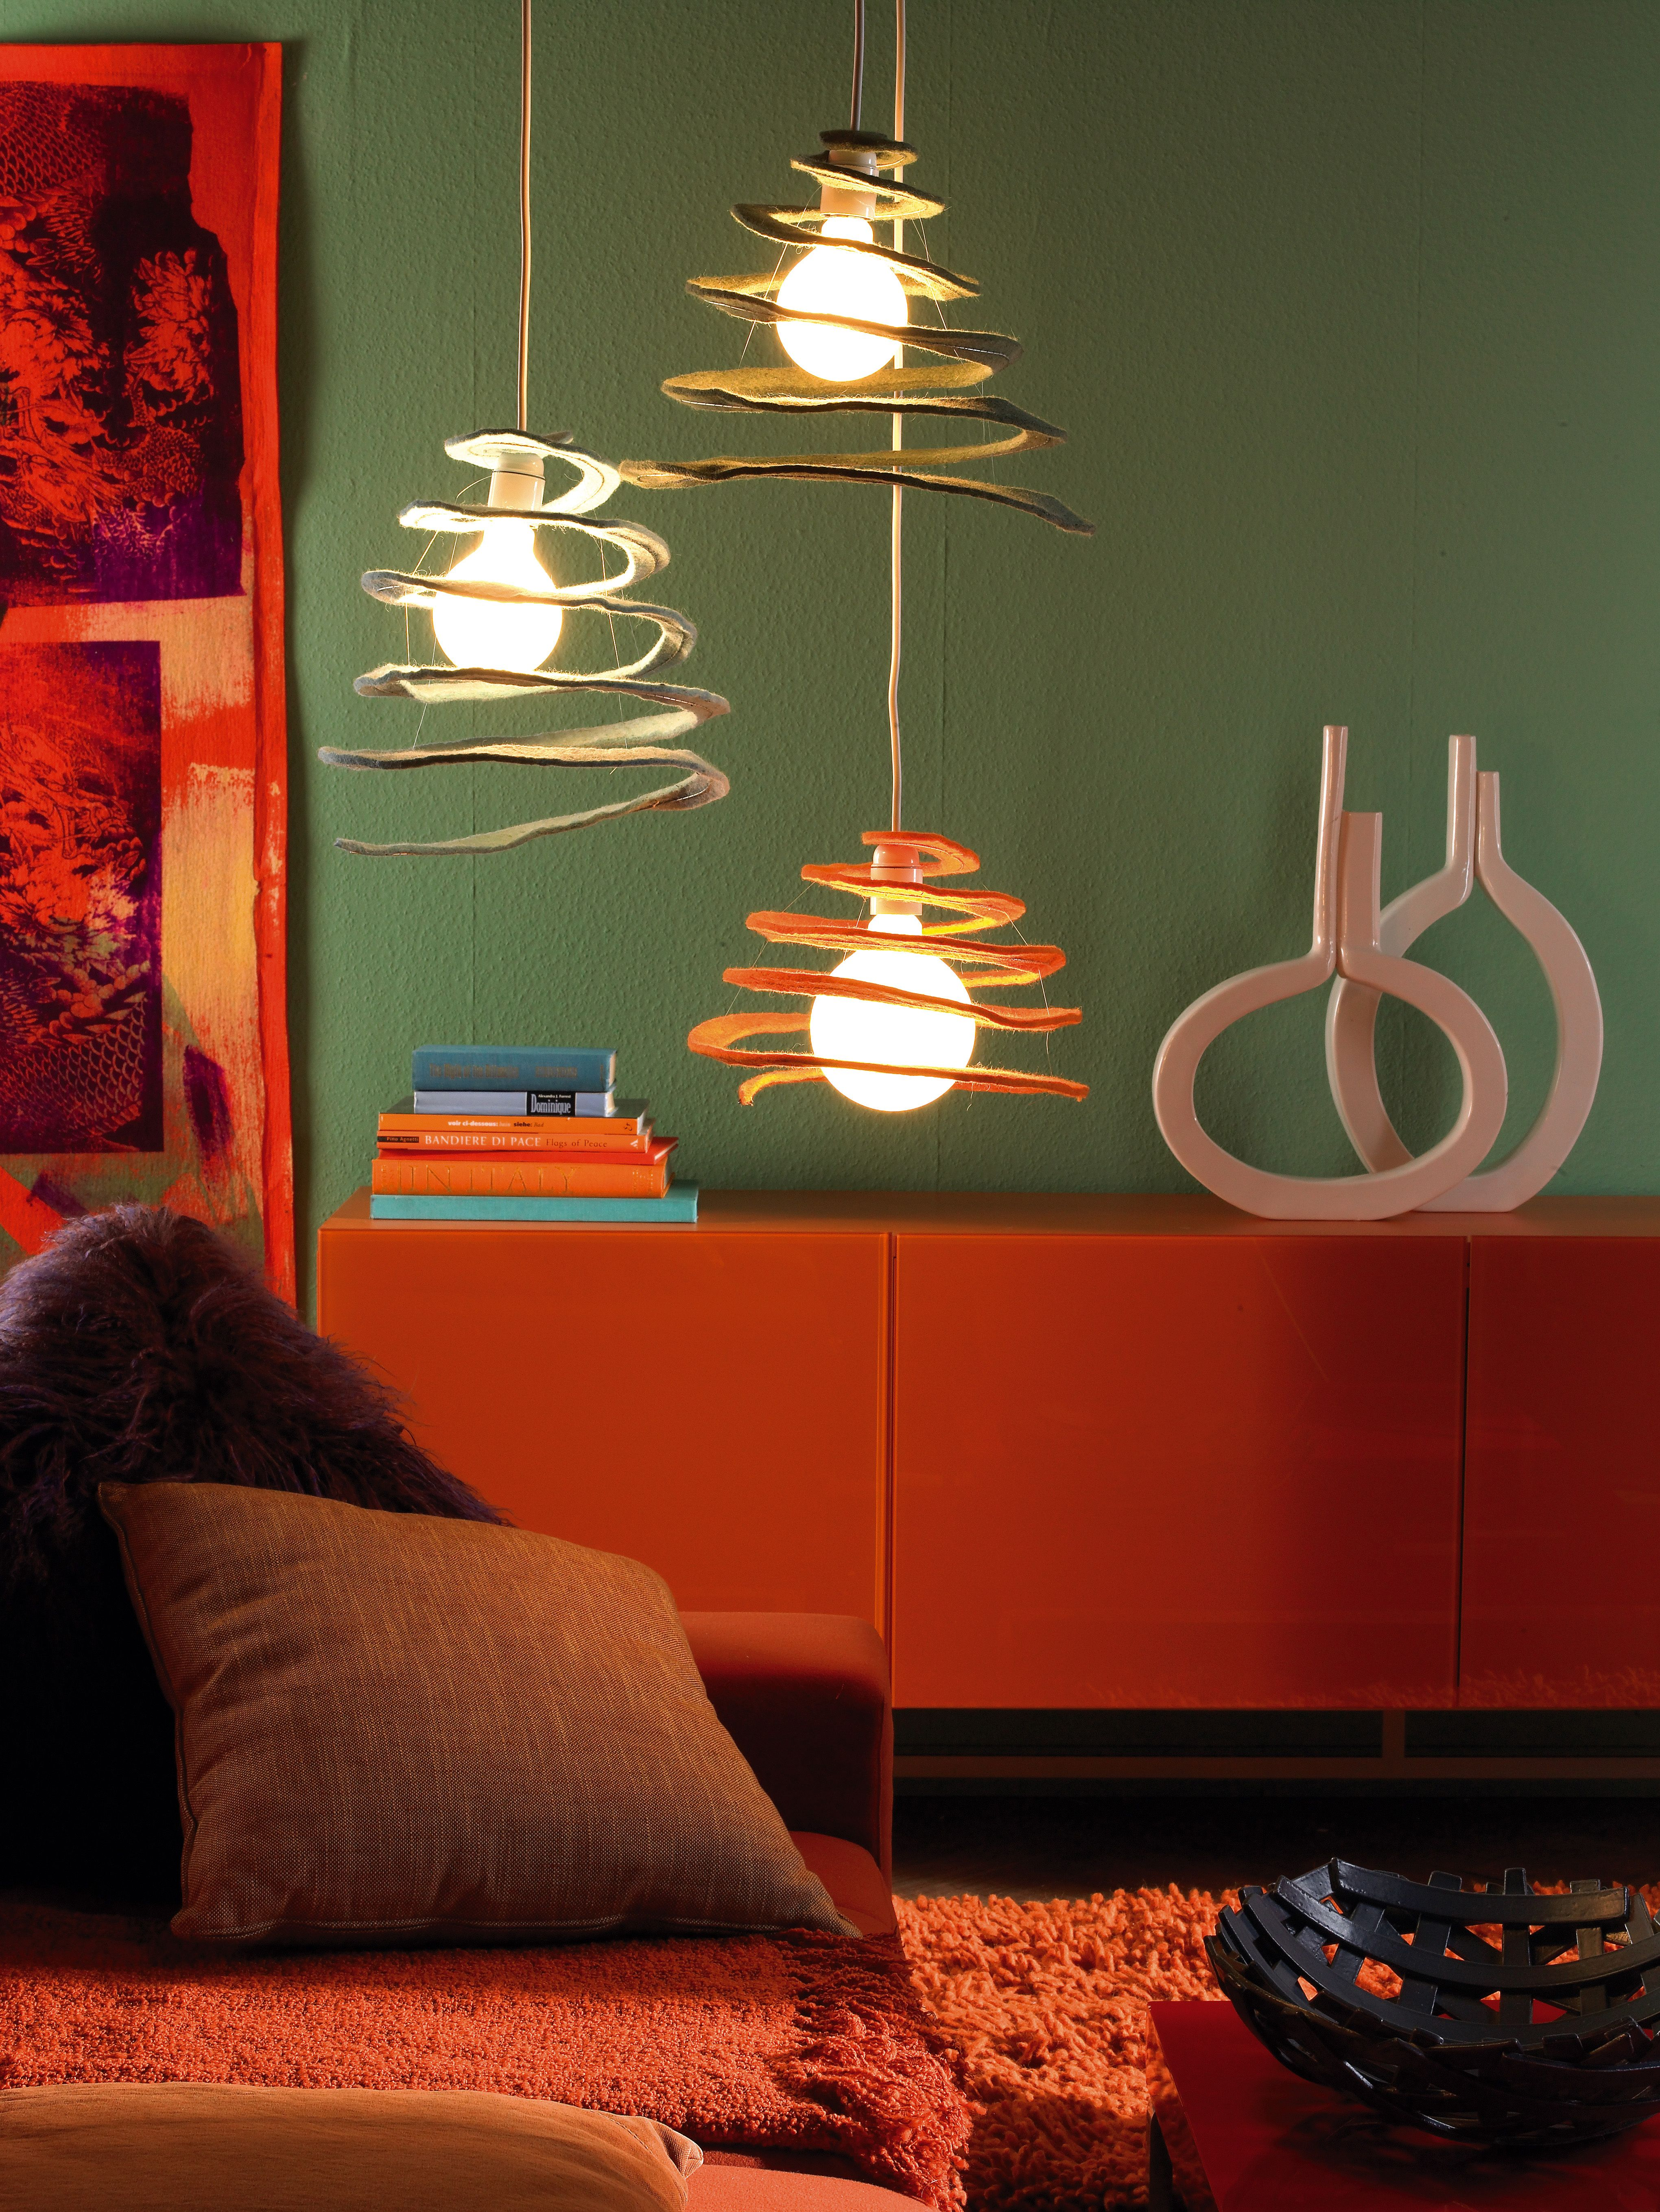 Lampada fai da te idee creative per la casa fai da te for Fai da te idee per la casa